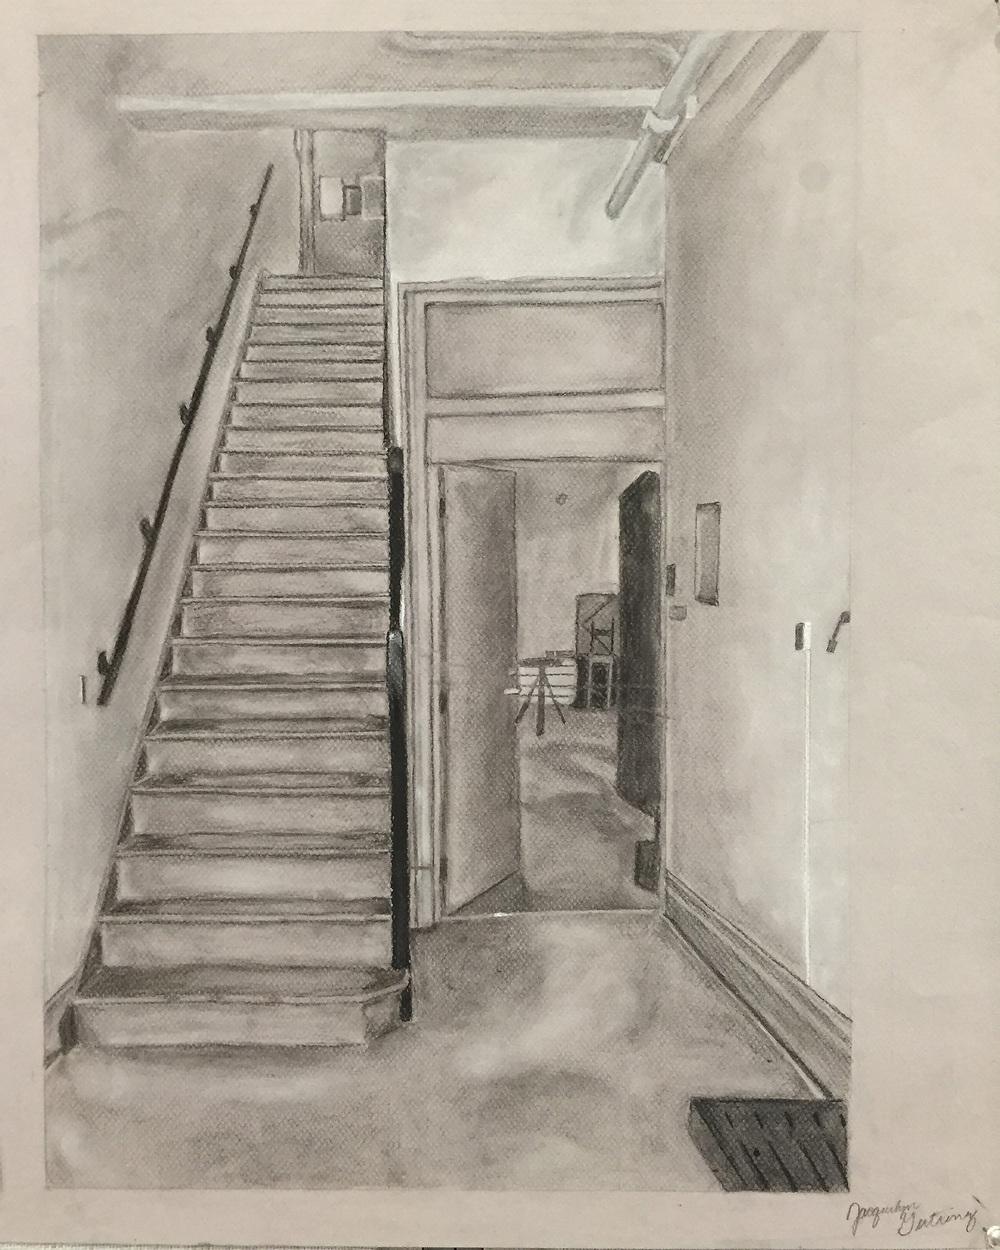 staircase8x10 copy.jpg